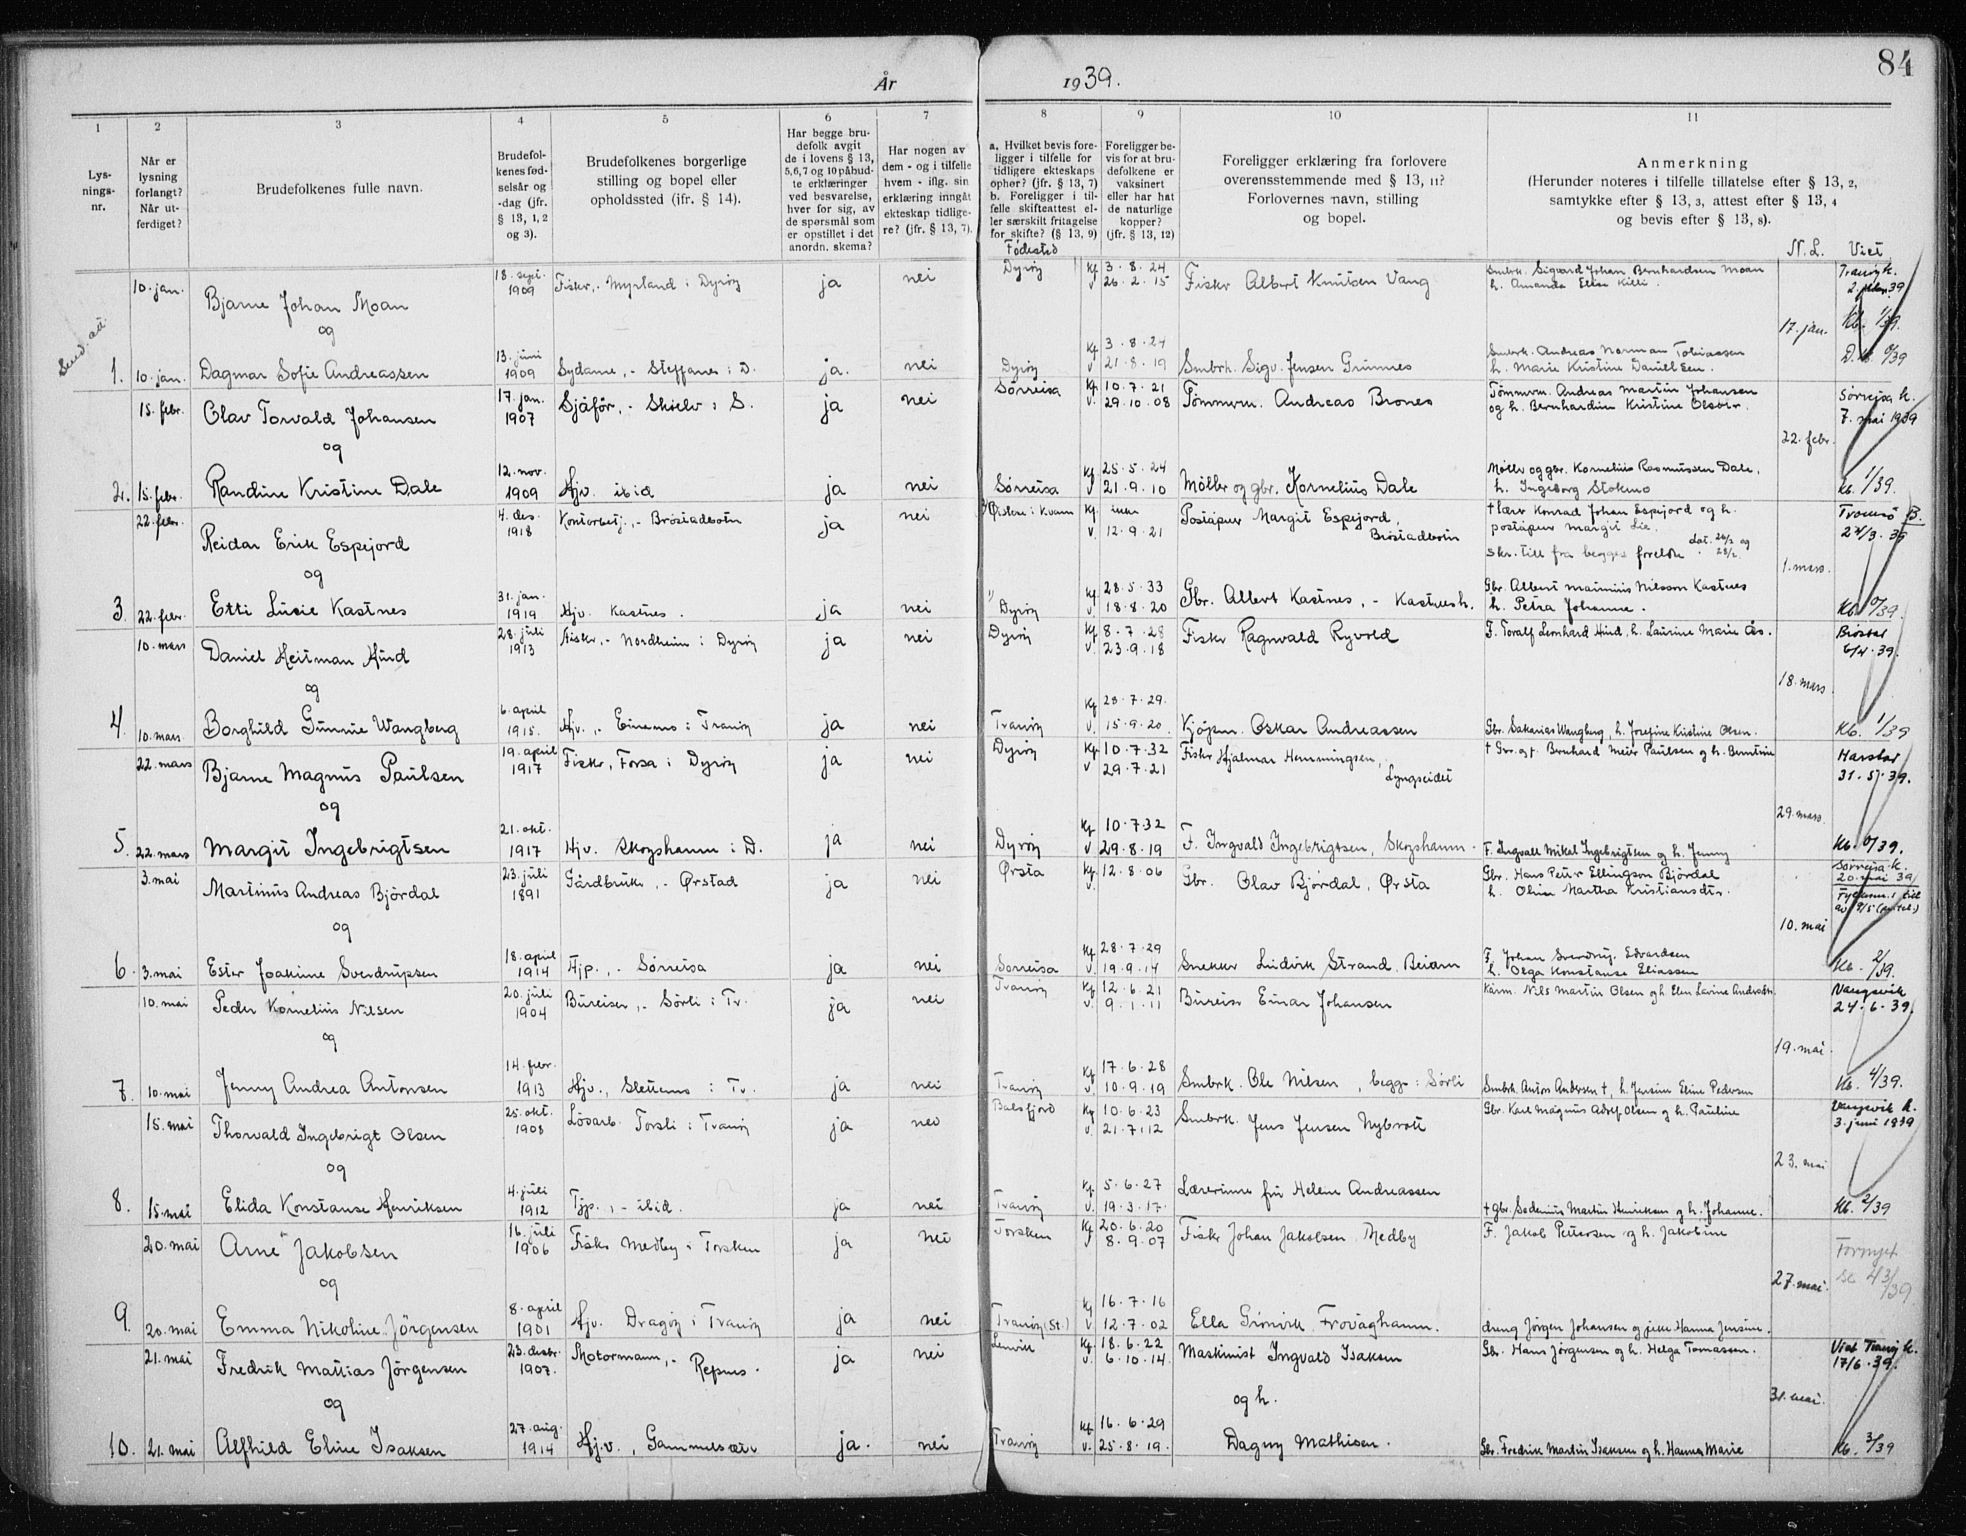 SATØ, Tranøy sokneprestkontor, J/Jc/L0053: Lysningsprotokoll nr. 53, 1919-1940, s. 84